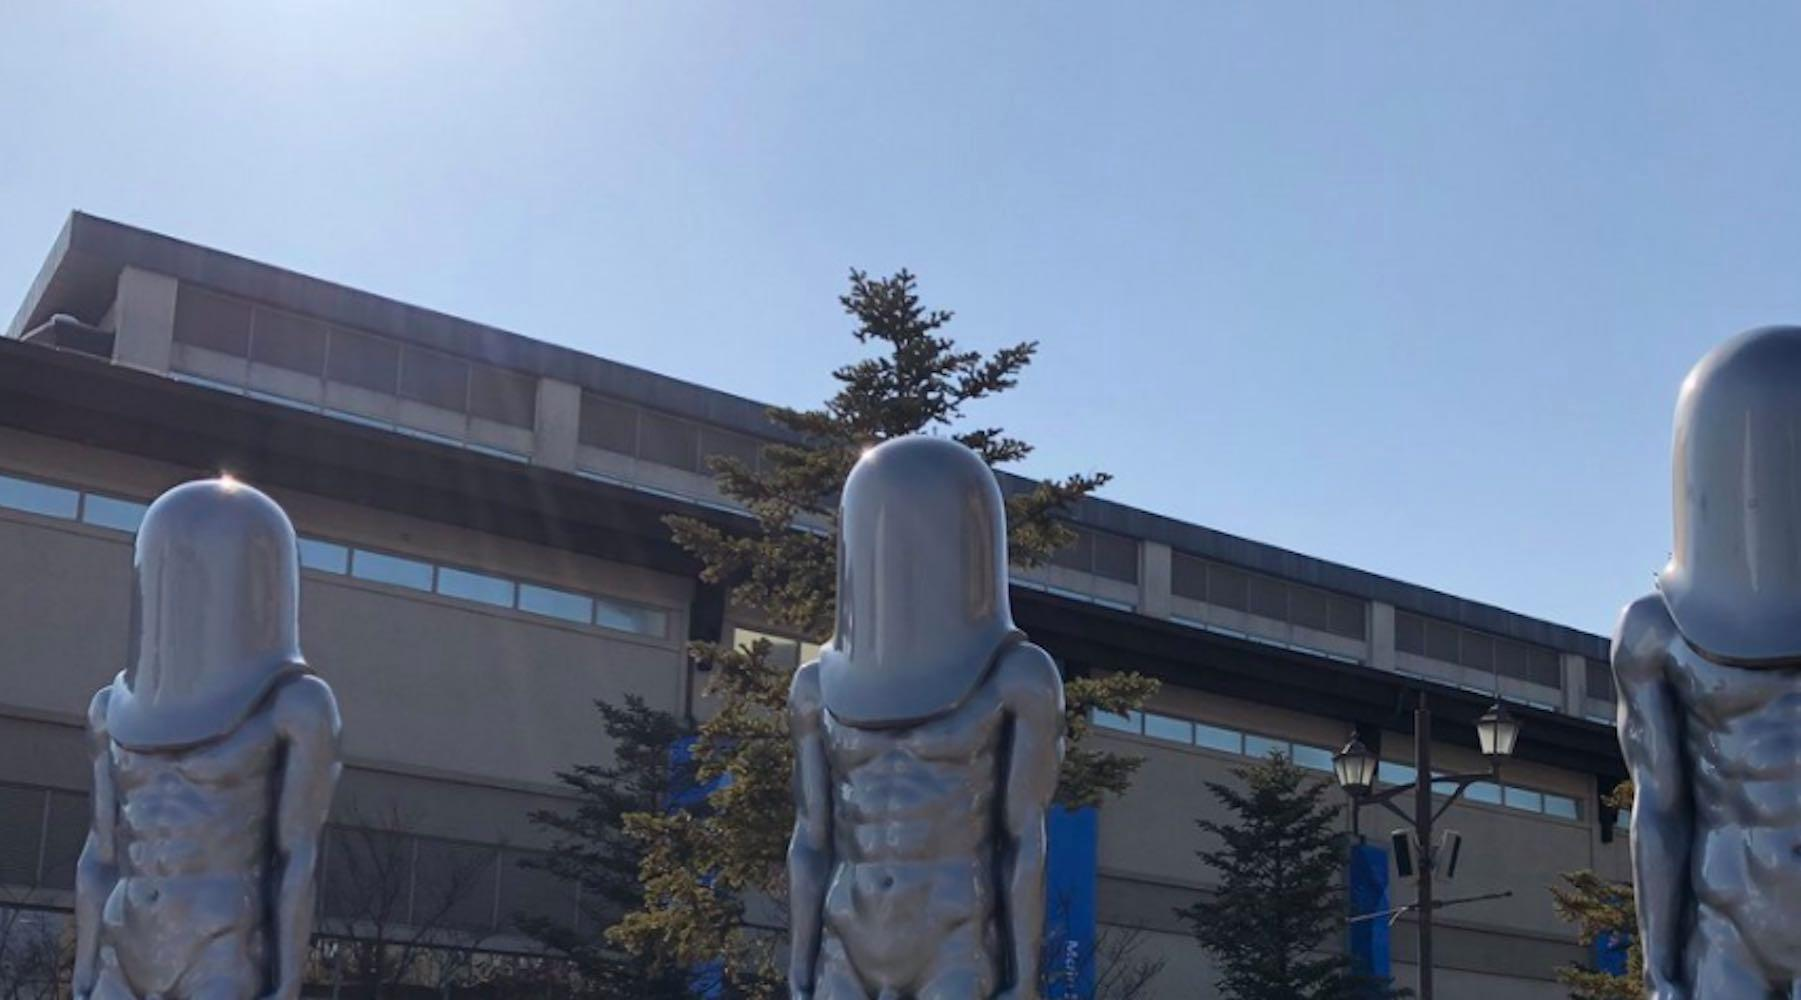 statues-1518532680574.jpg